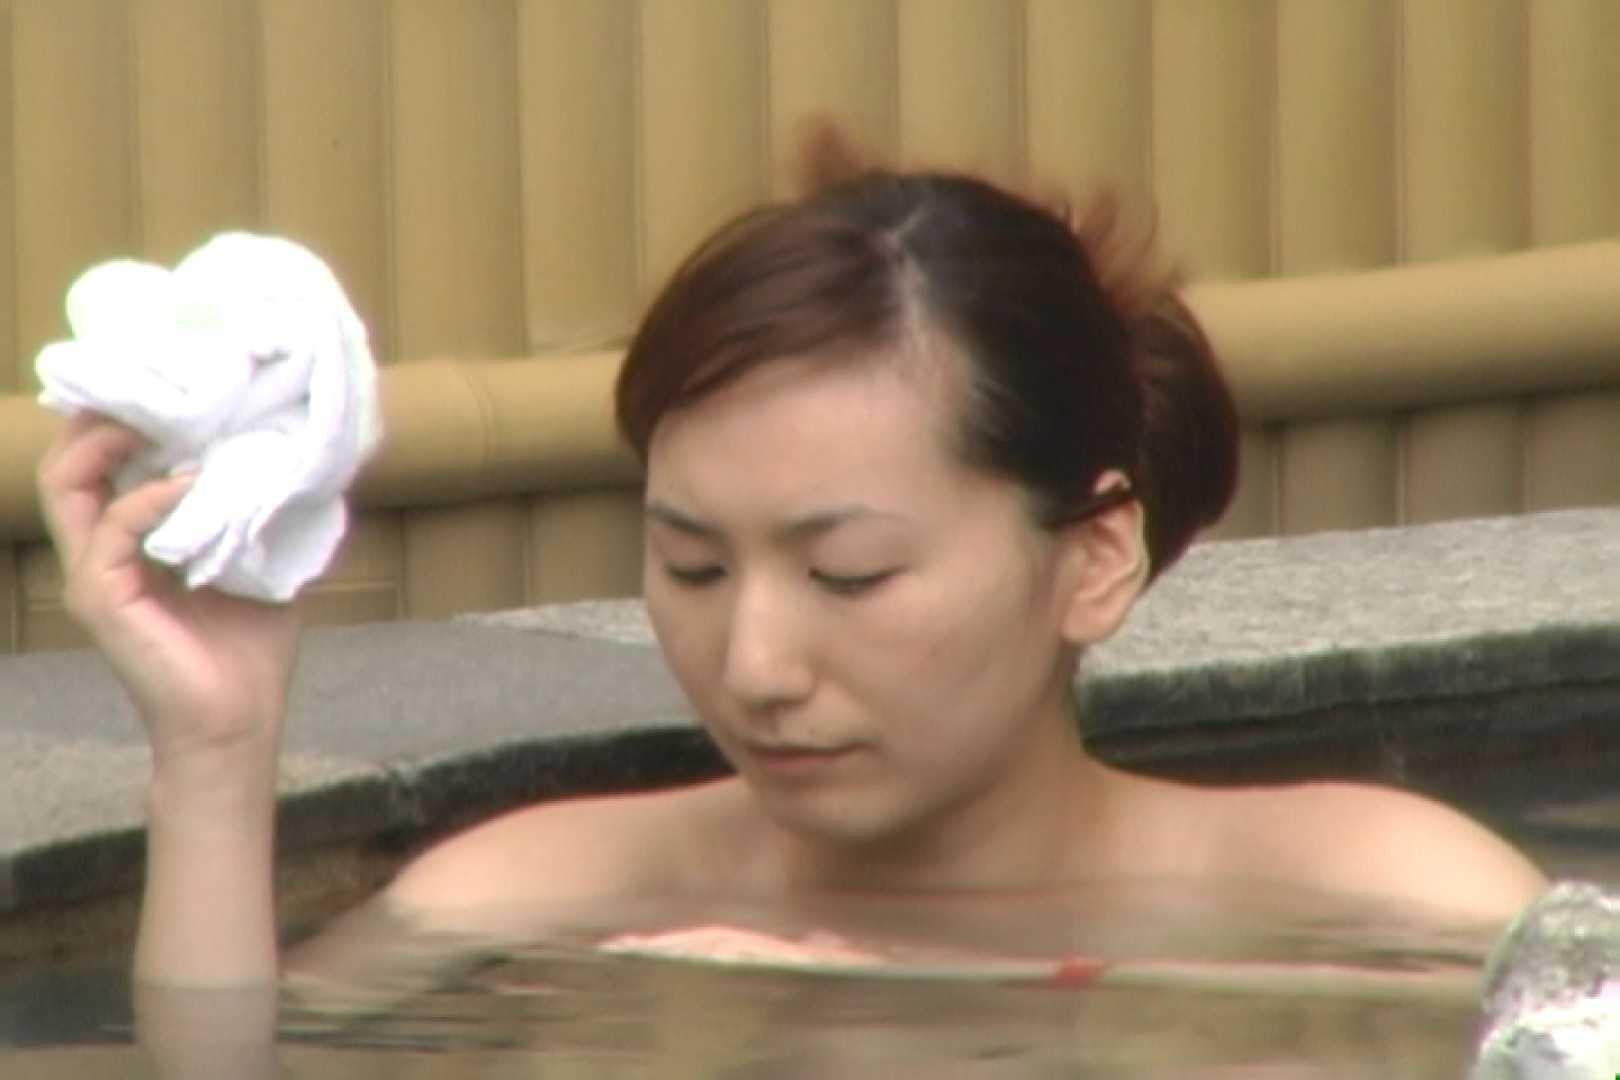 Aquaな露天風呂Vol.616 露天風呂編   盗撮シリーズ  89PIX 5